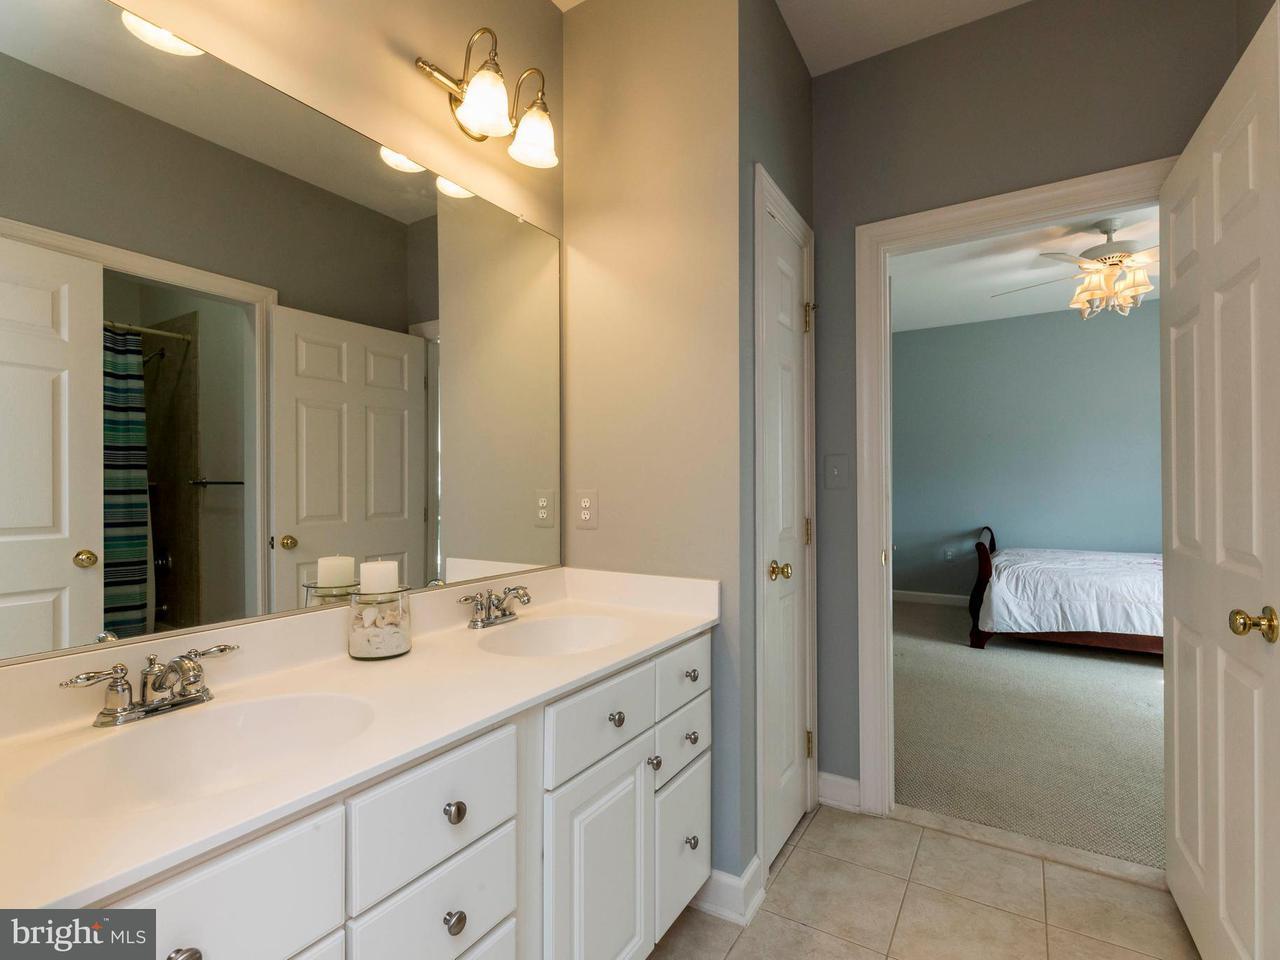 Additional photo for property listing at 611 CASCADE VIEW Court 611 CASCADE VIEW Court Parkton, Maryland 21120 Estados Unidos